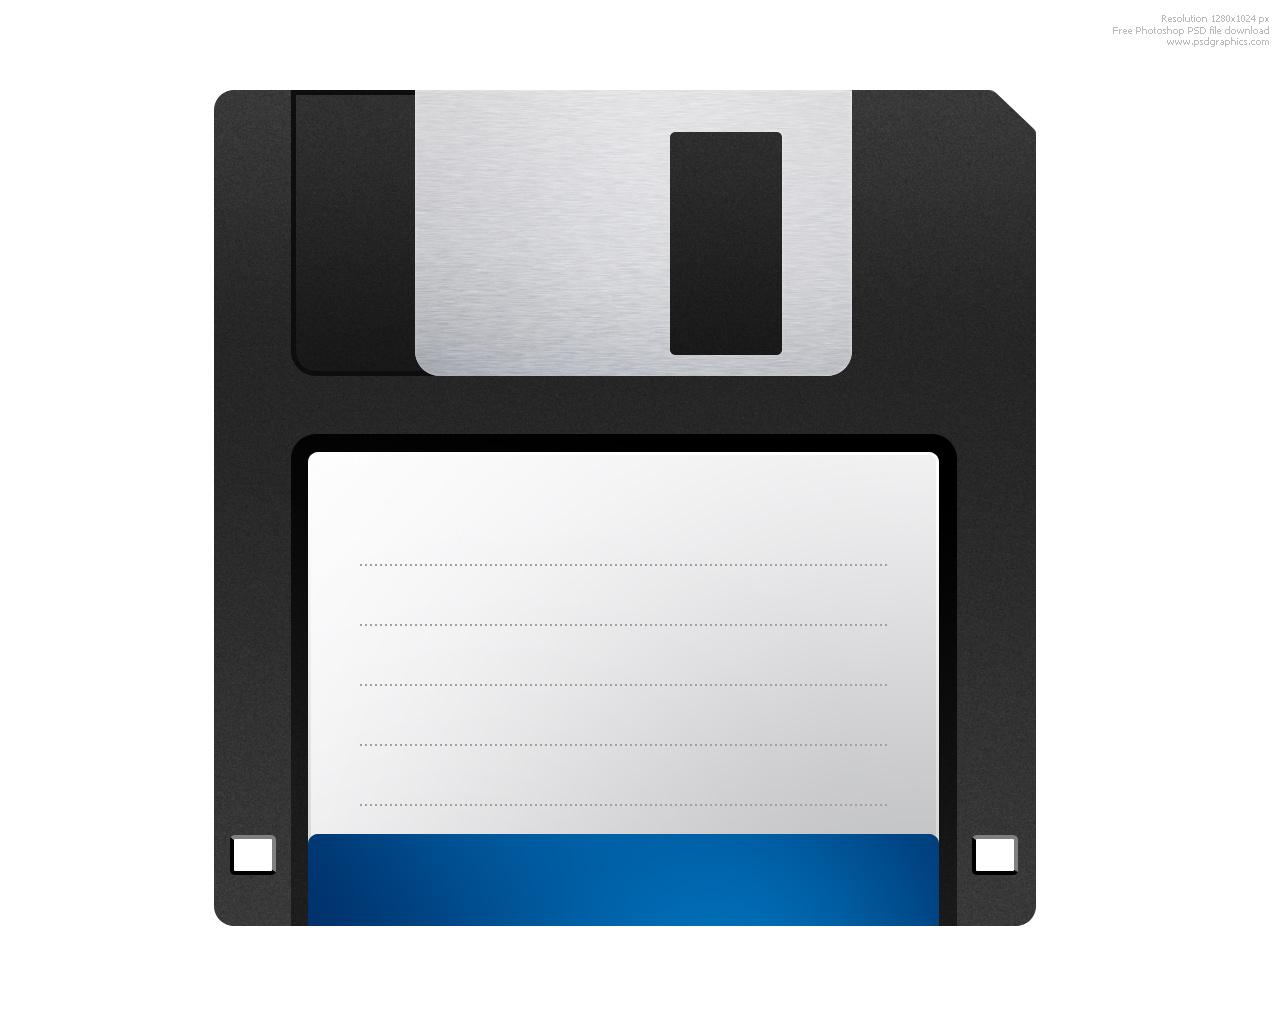 Unrealistic Future: Good Bye Floppy